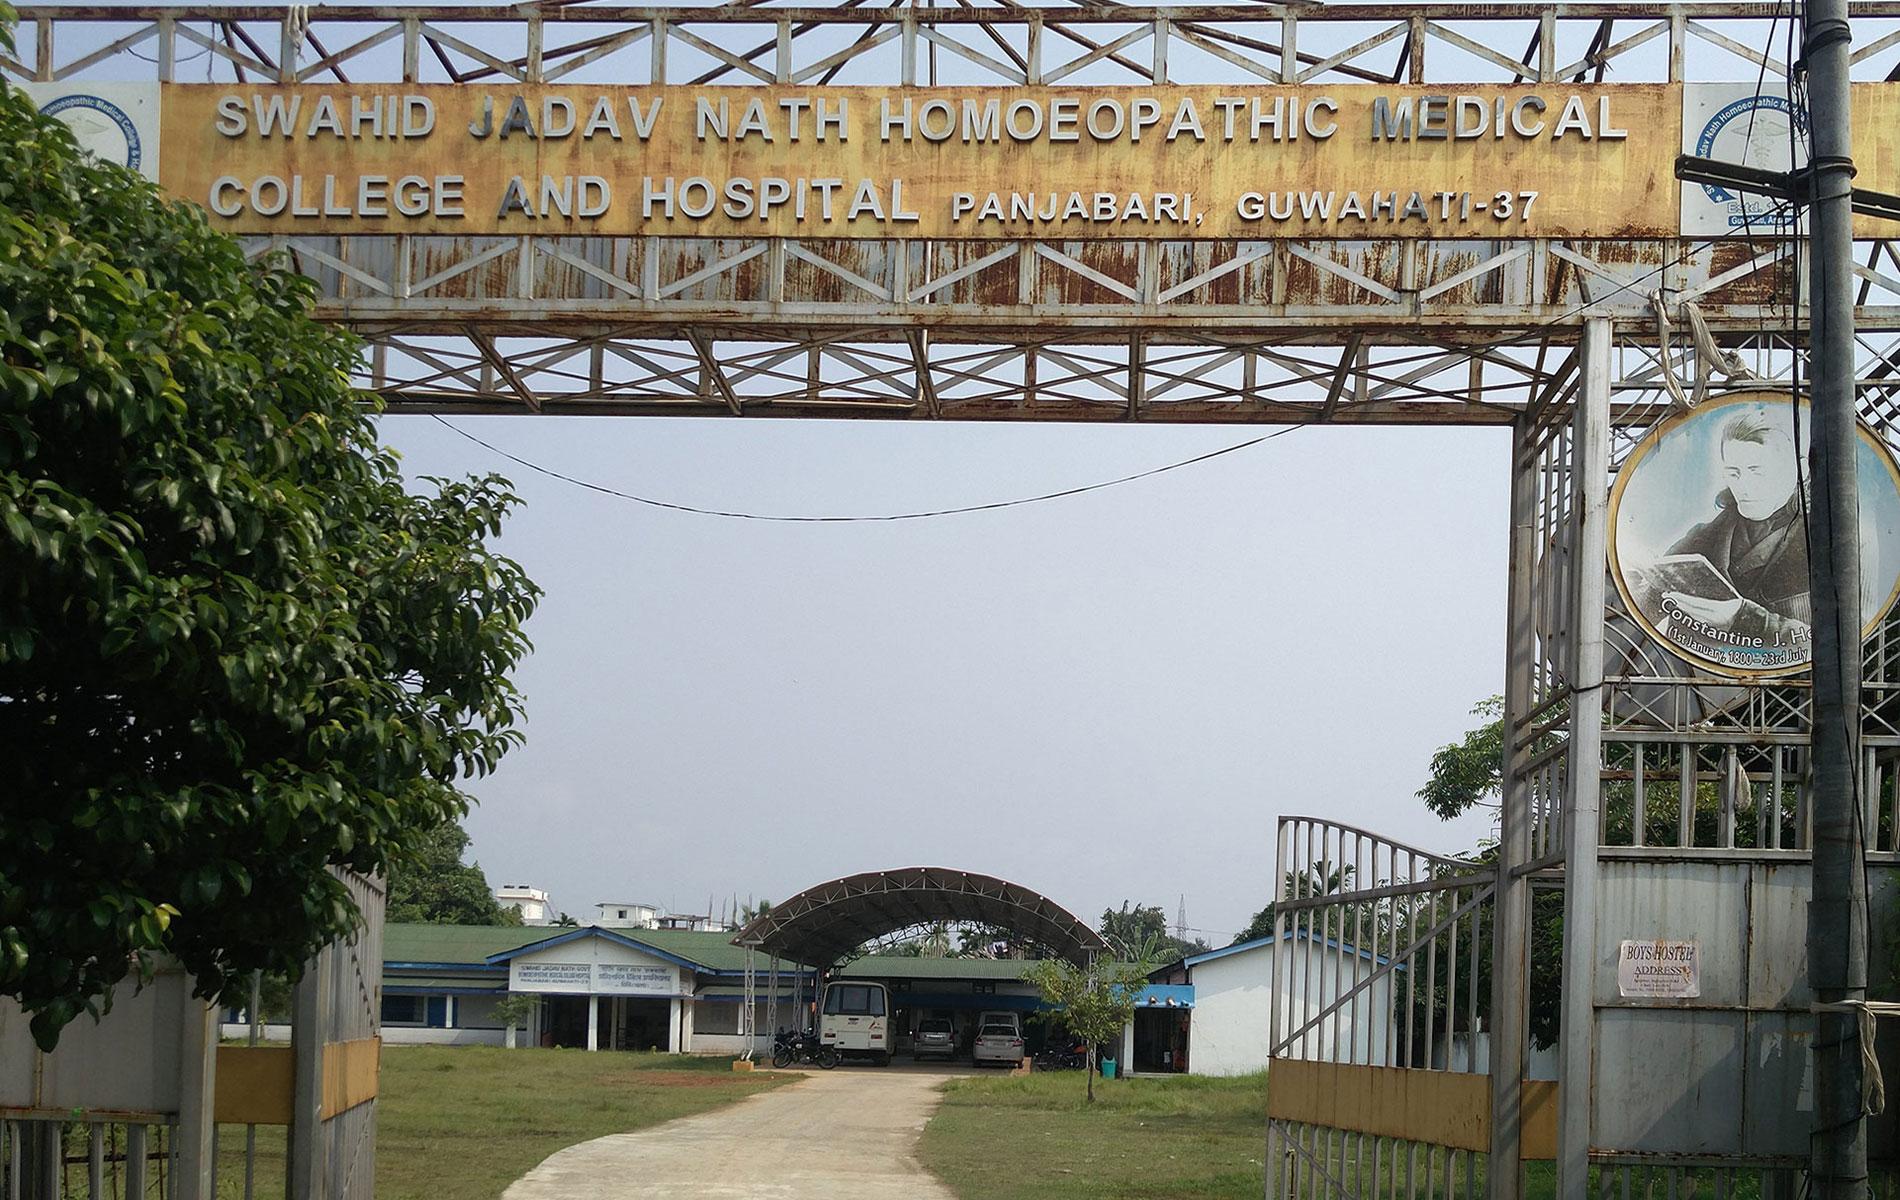 Swahid Jadav Nath Homoeopathic Medical College & Hospital Image